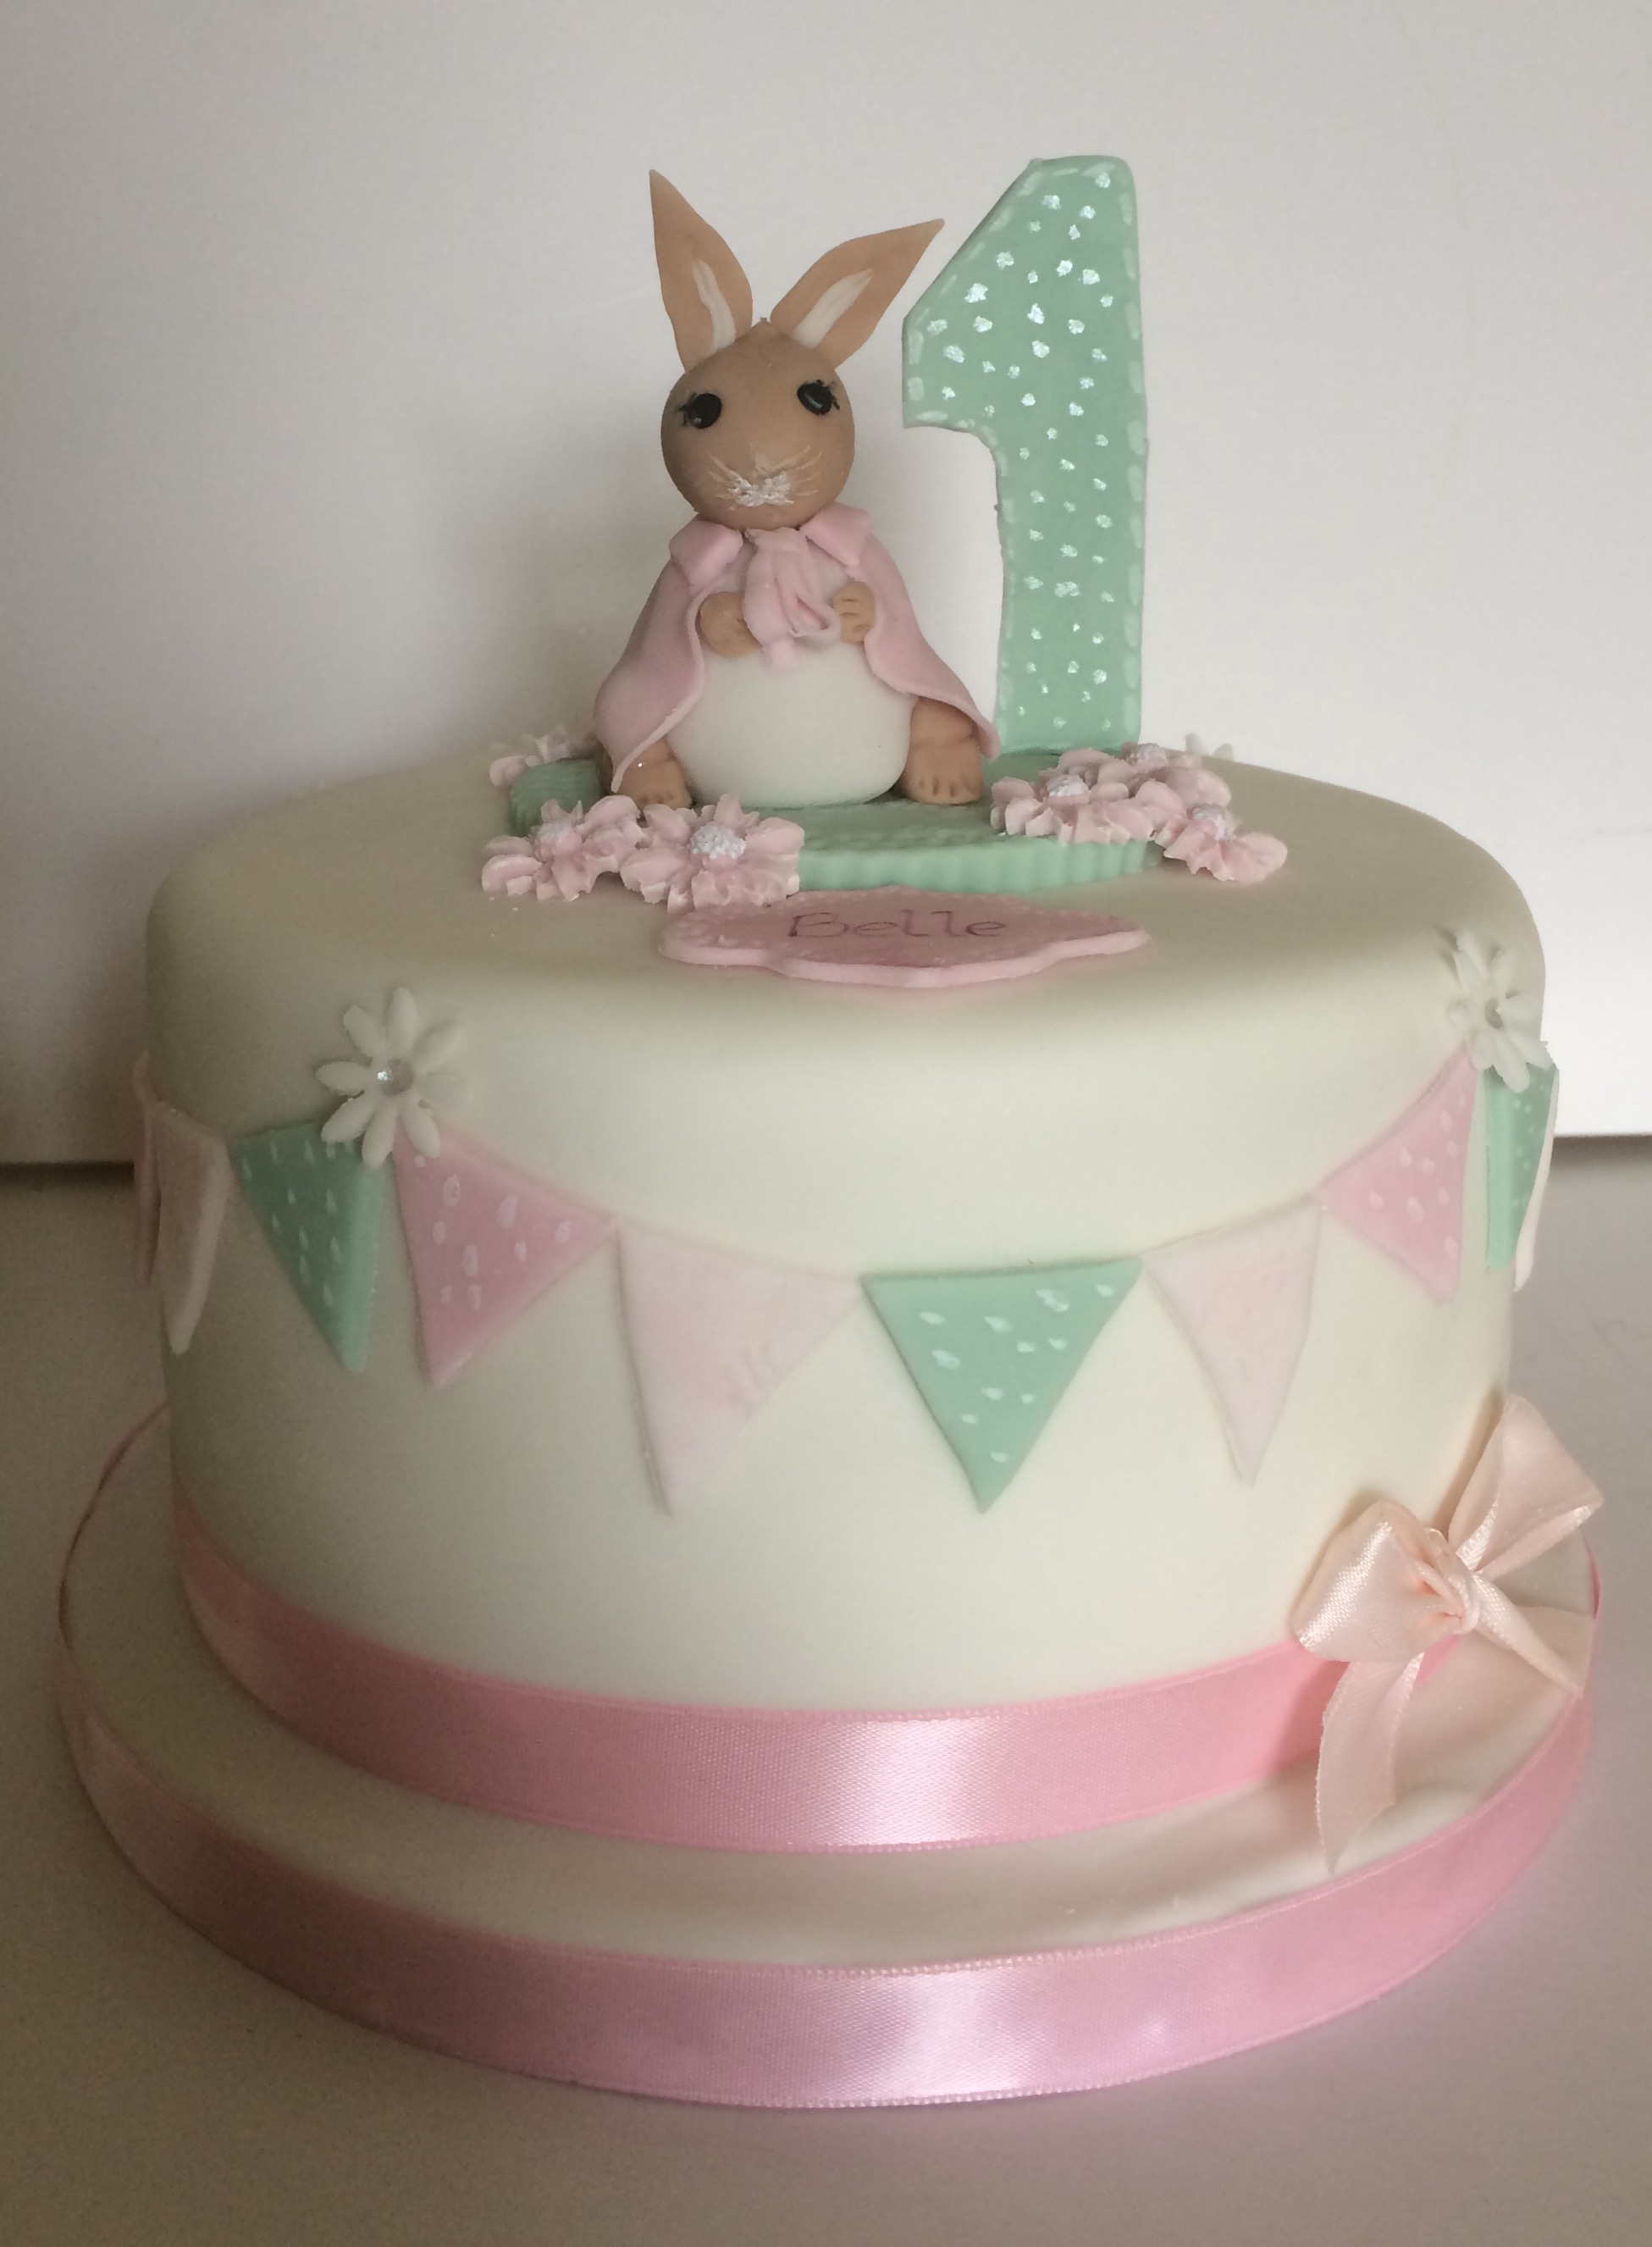 1st Birthday Cake - Village Green Bakes